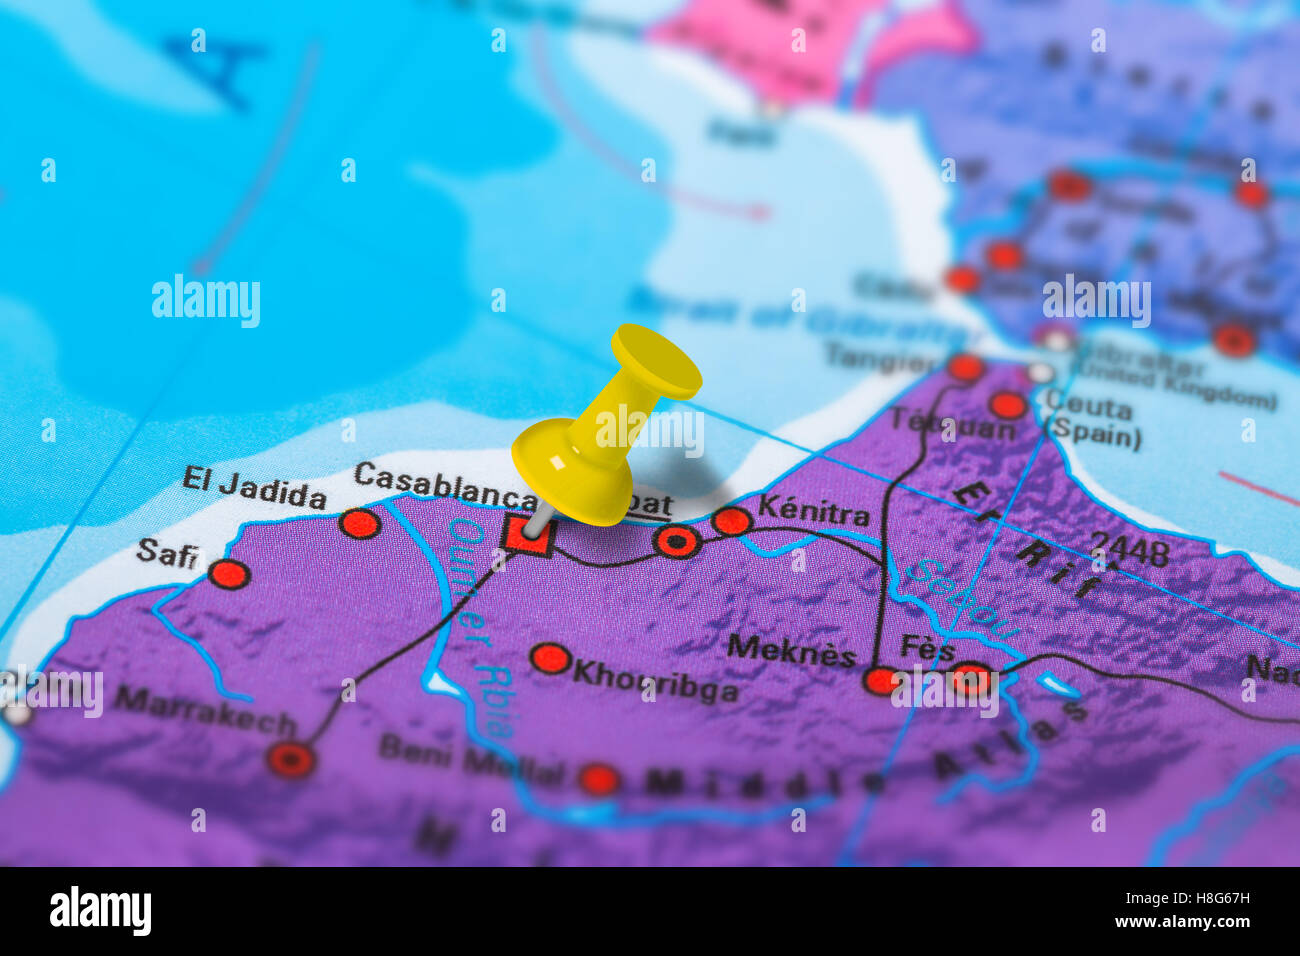 Casablanca Morocco map Stock Photo 125745973 Alamy